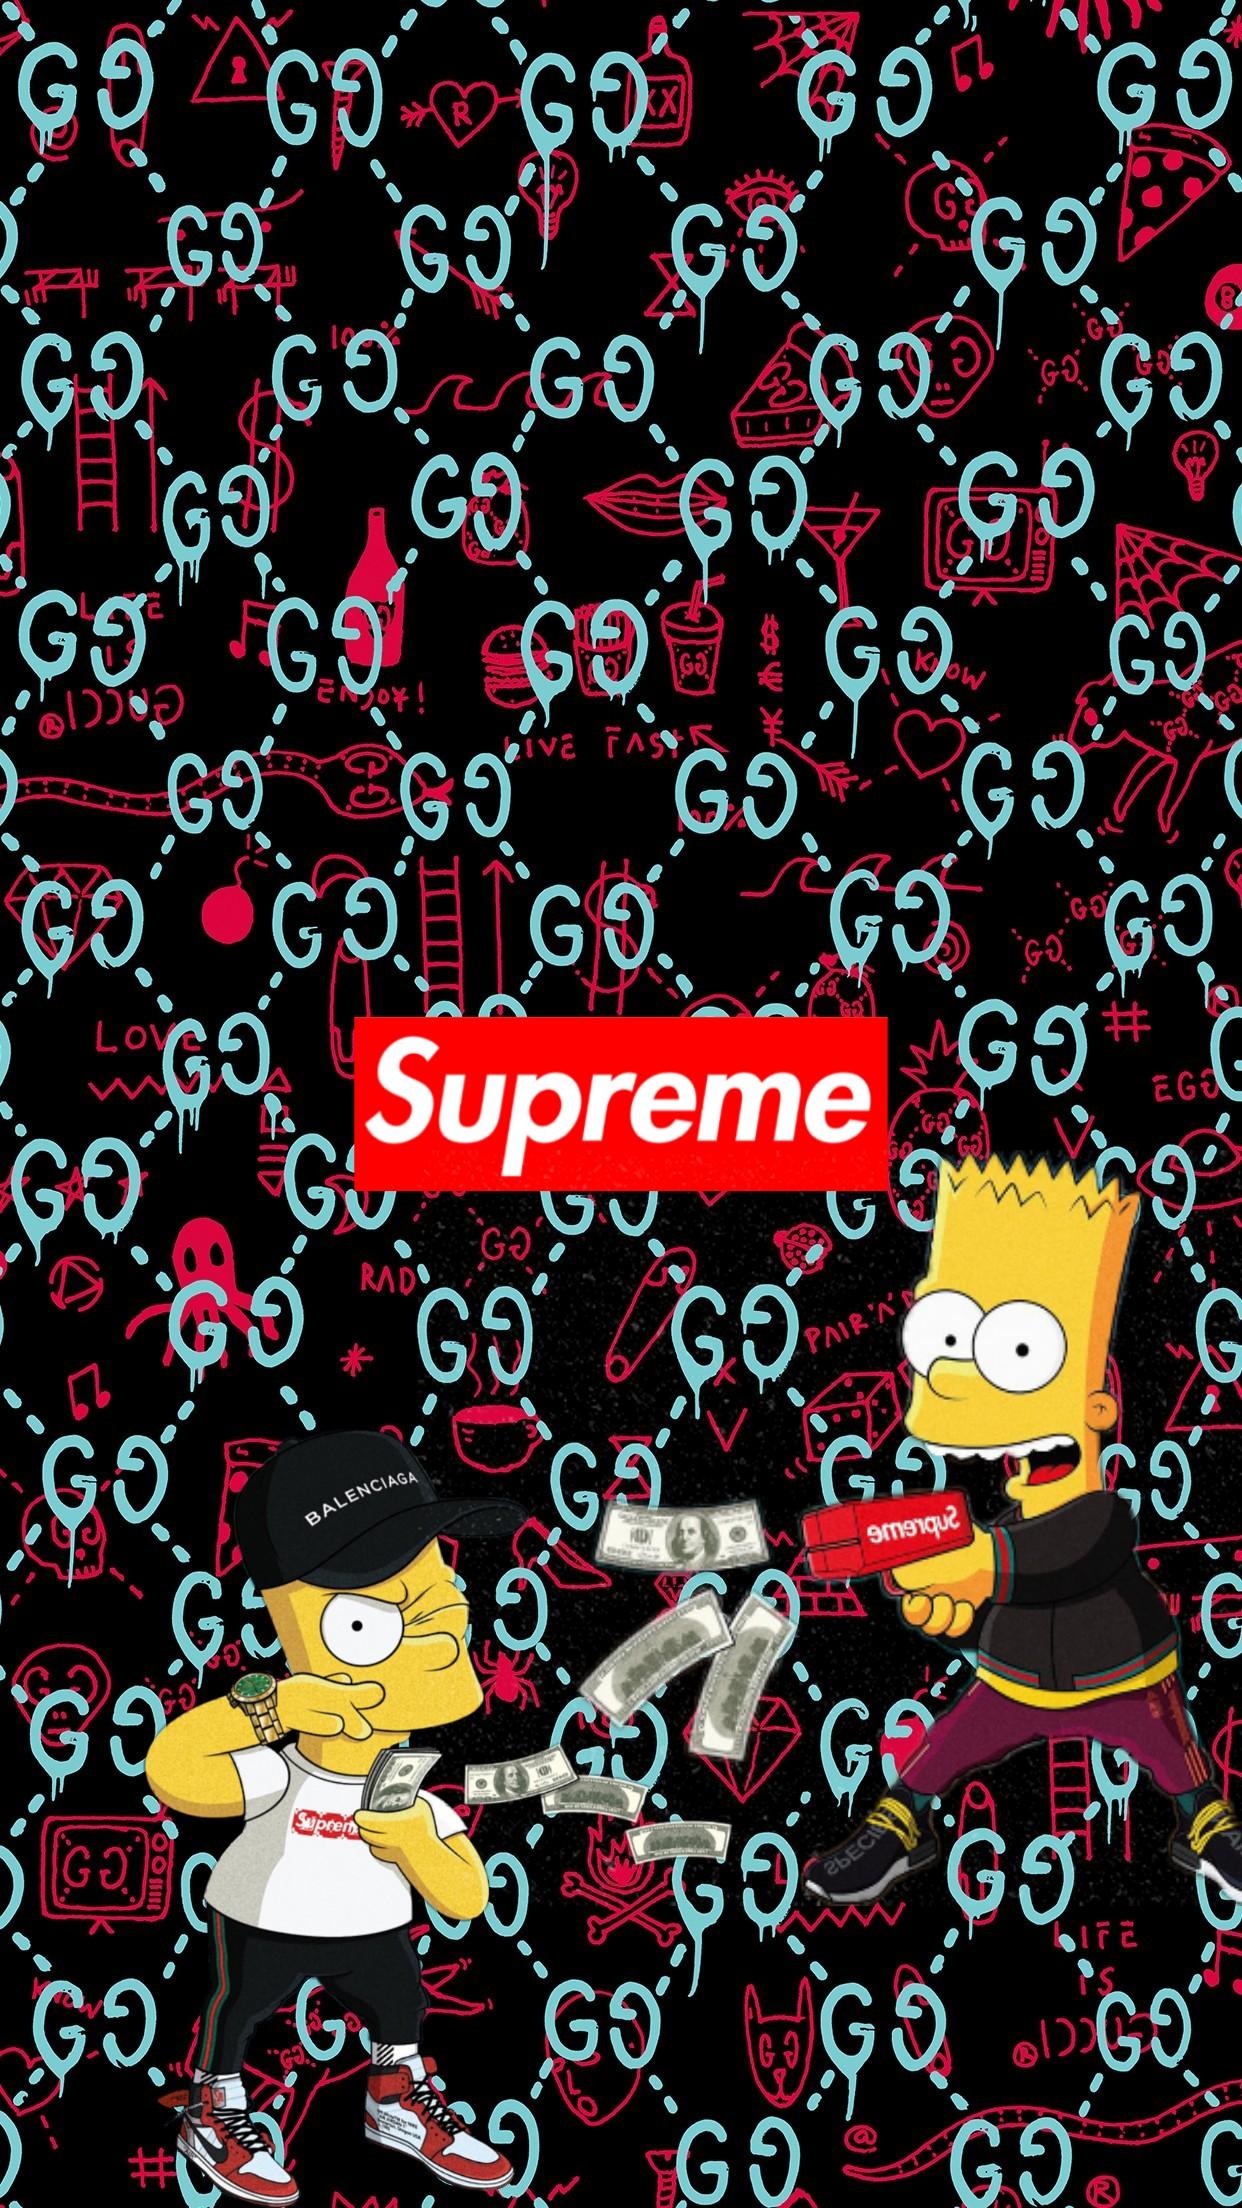 Supreme Bape Simpsons Image By Adellah048